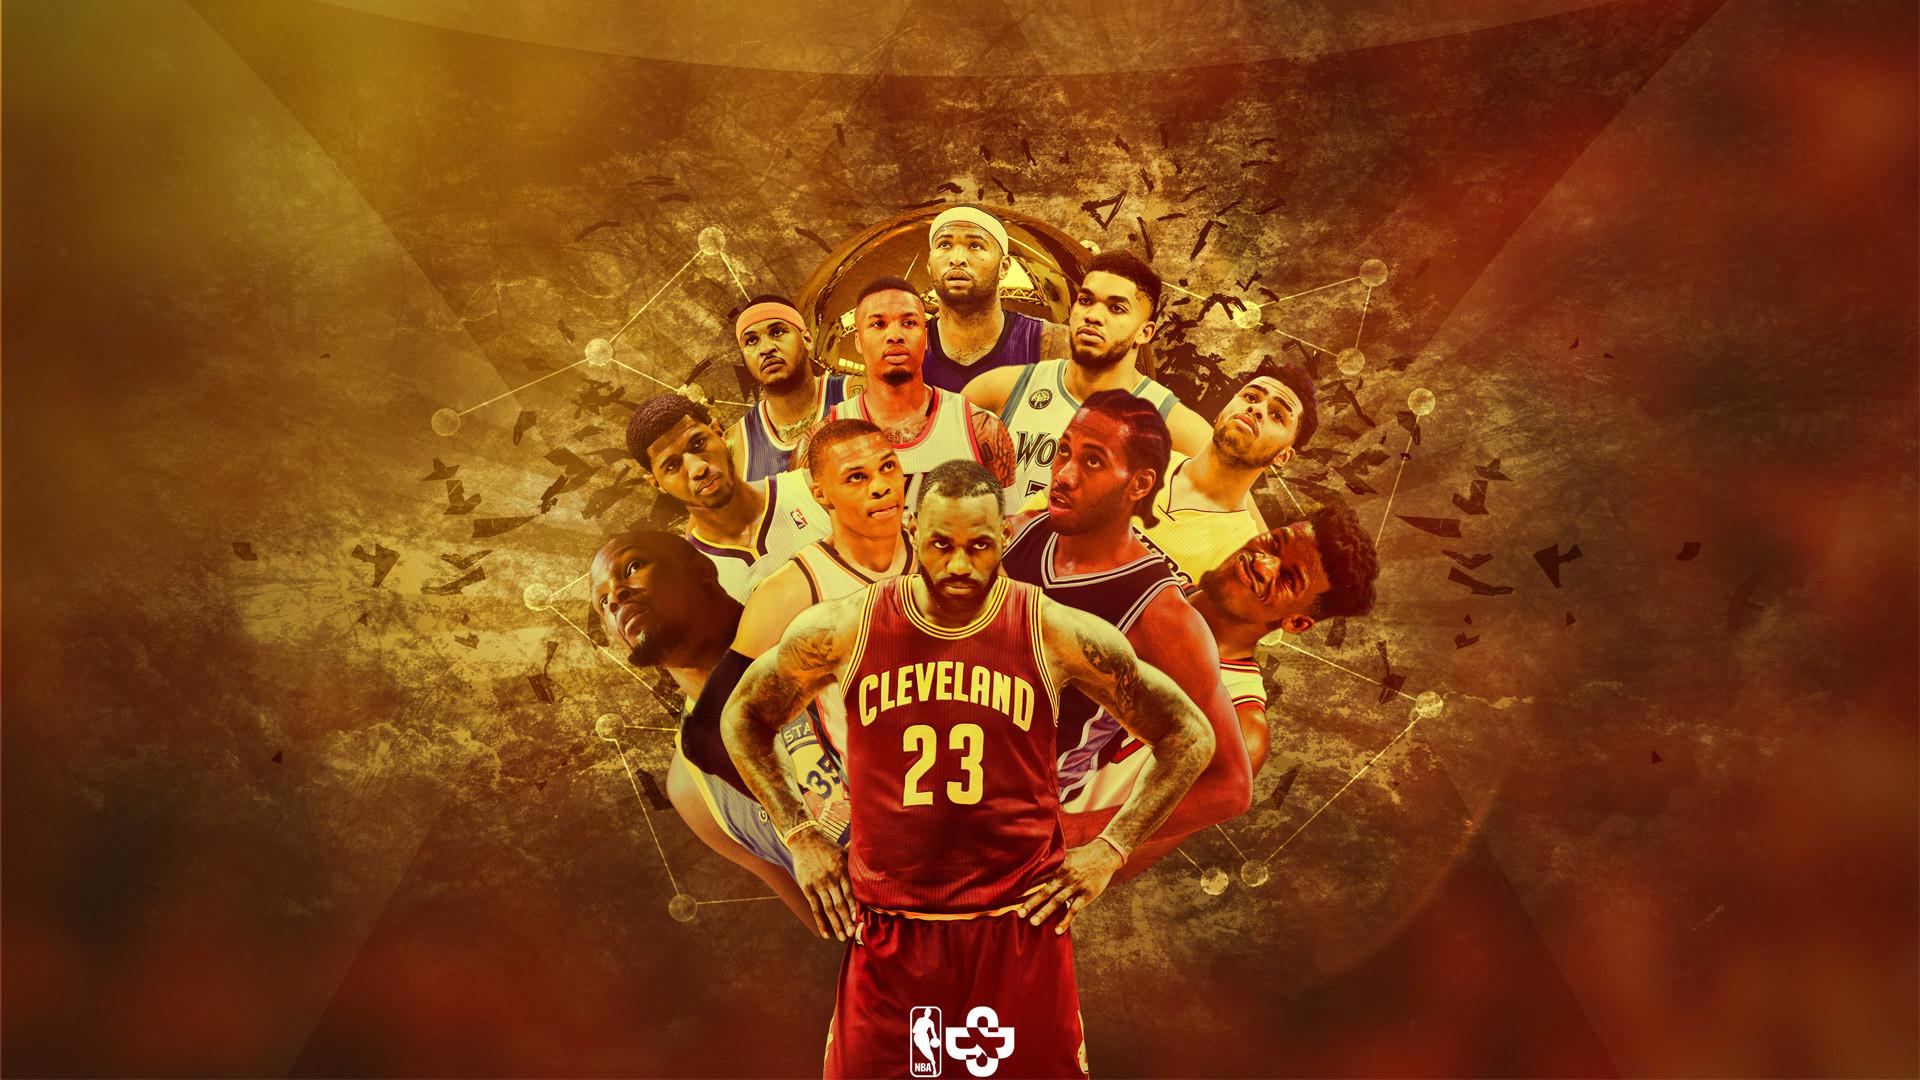 NBA Season 2016-2017 is Coming Wallpaper